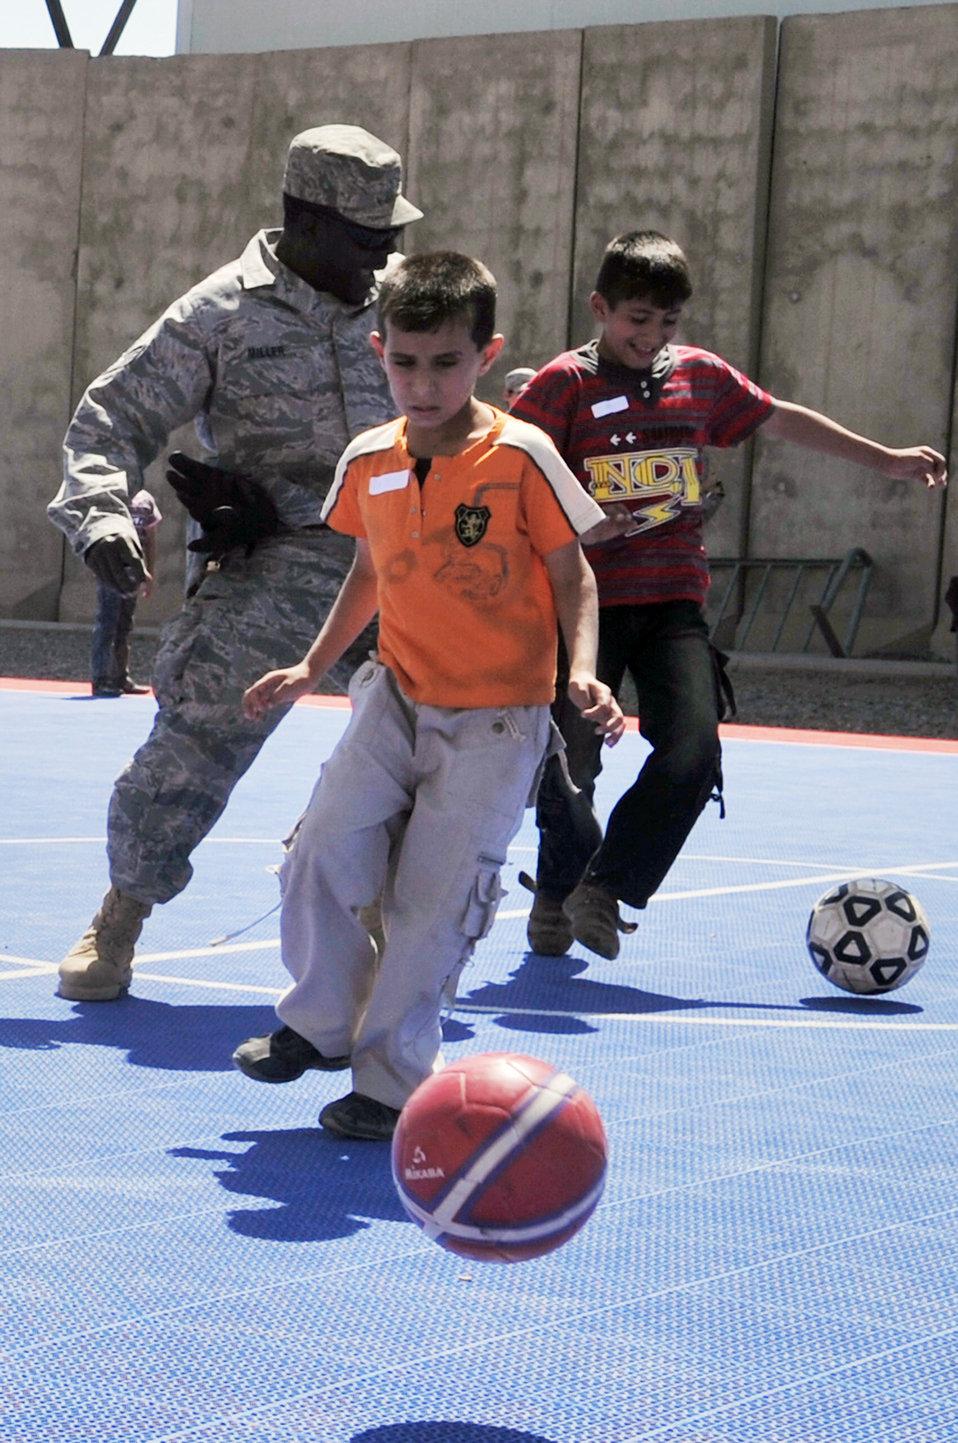 Balad servicemembers strengthen bonds with community, children